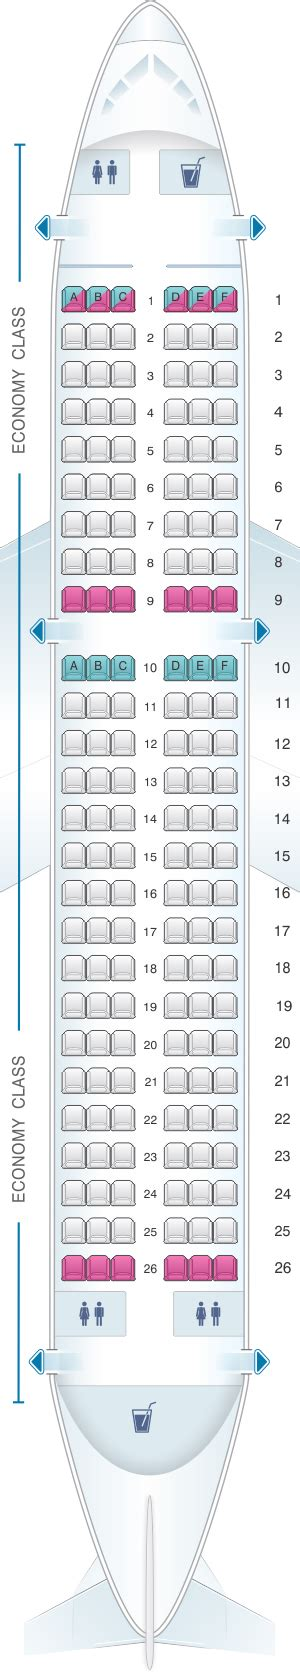 siege easyjet plan de cabine easyjet airbus a319 seatmaestro fr